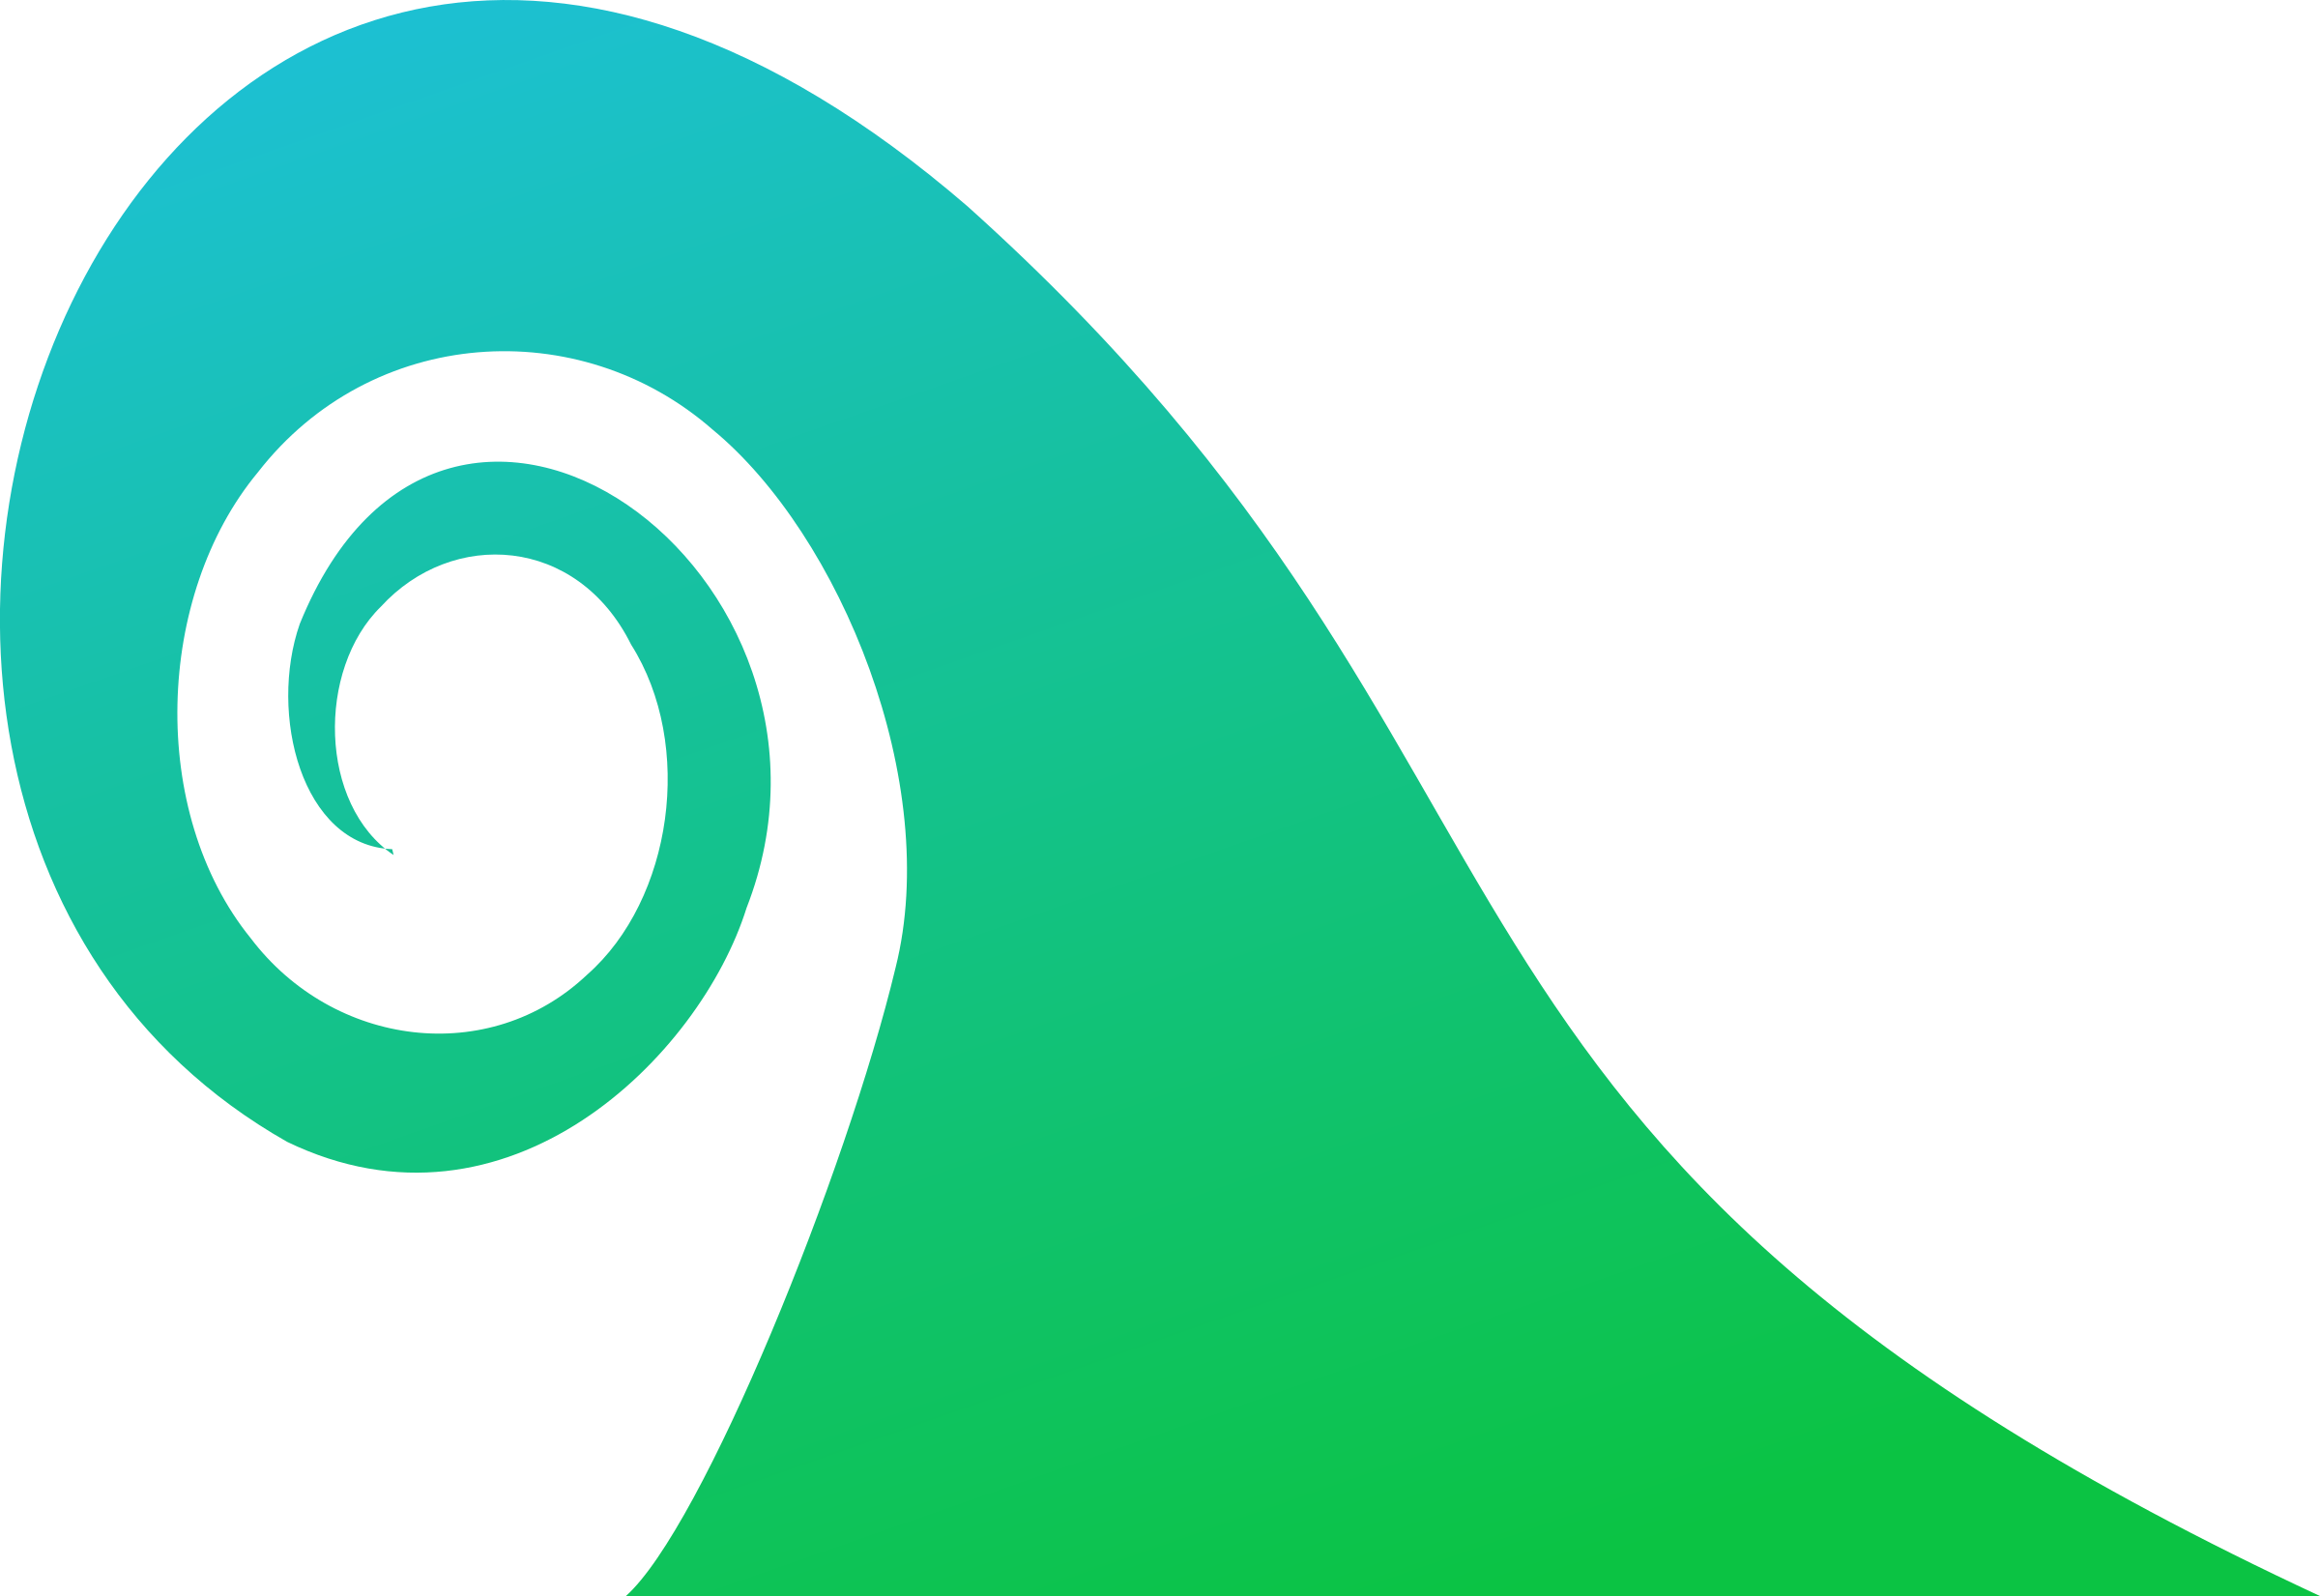 Wave big image png. Ocean clipart swirl